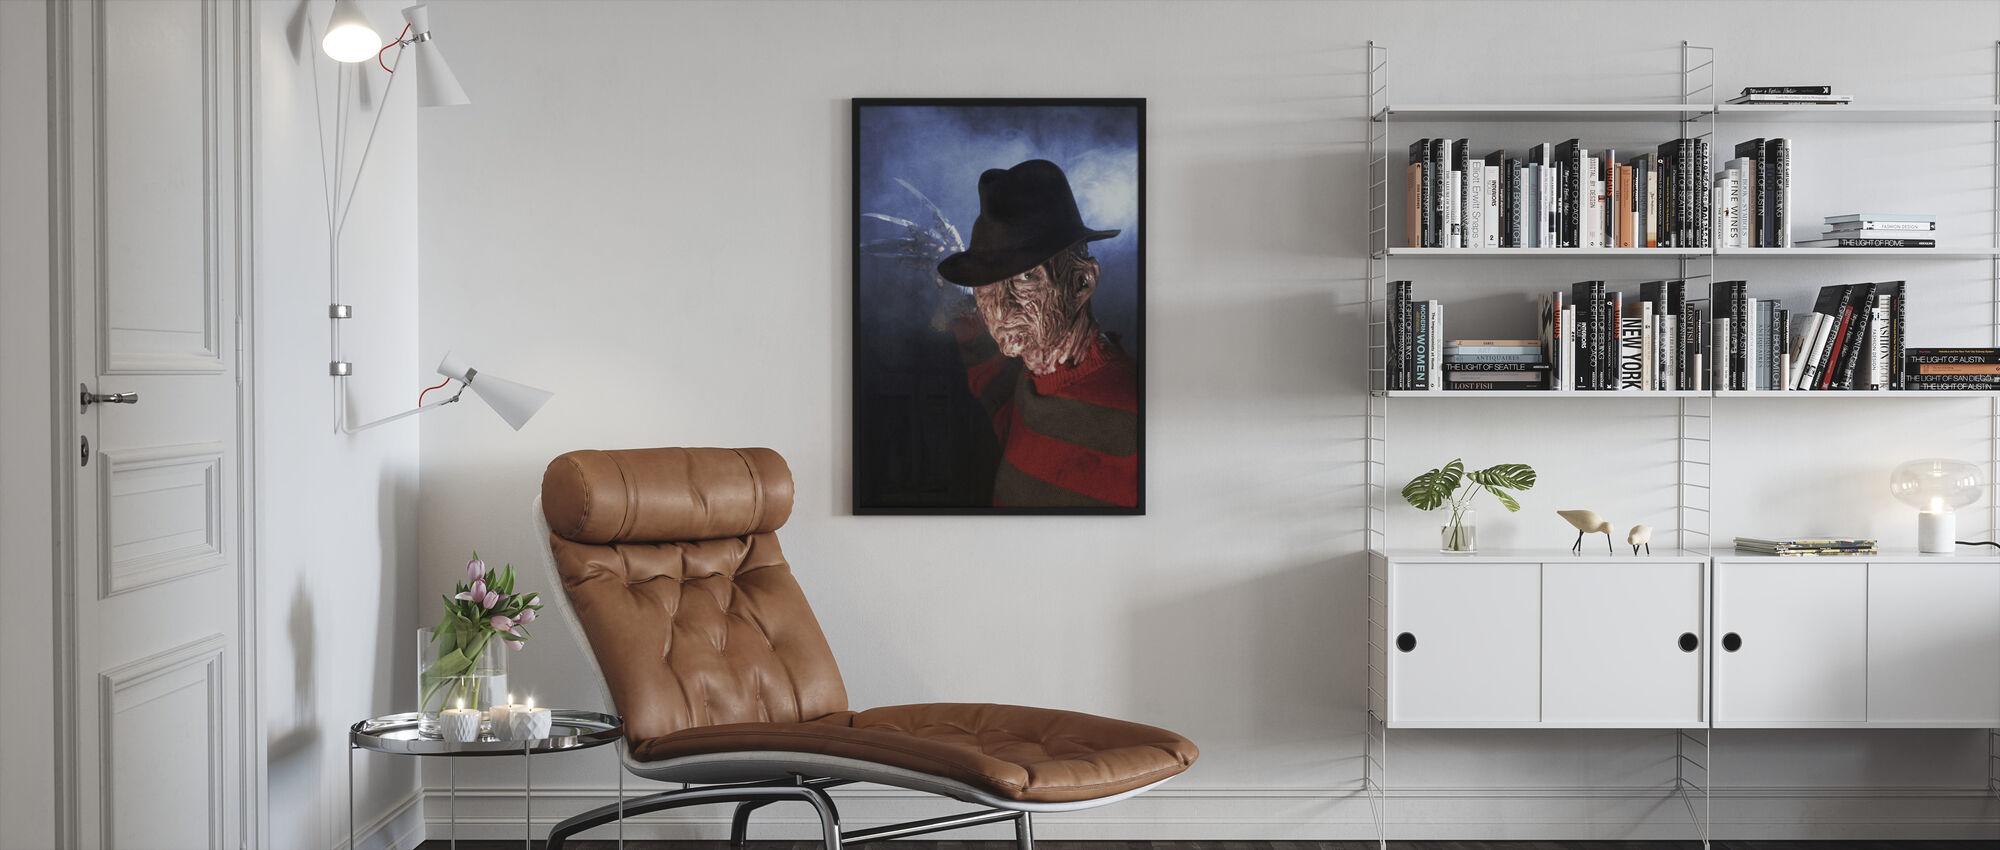 Robert Englund in a Nightmare on Elm Street - Framed print - Living Room